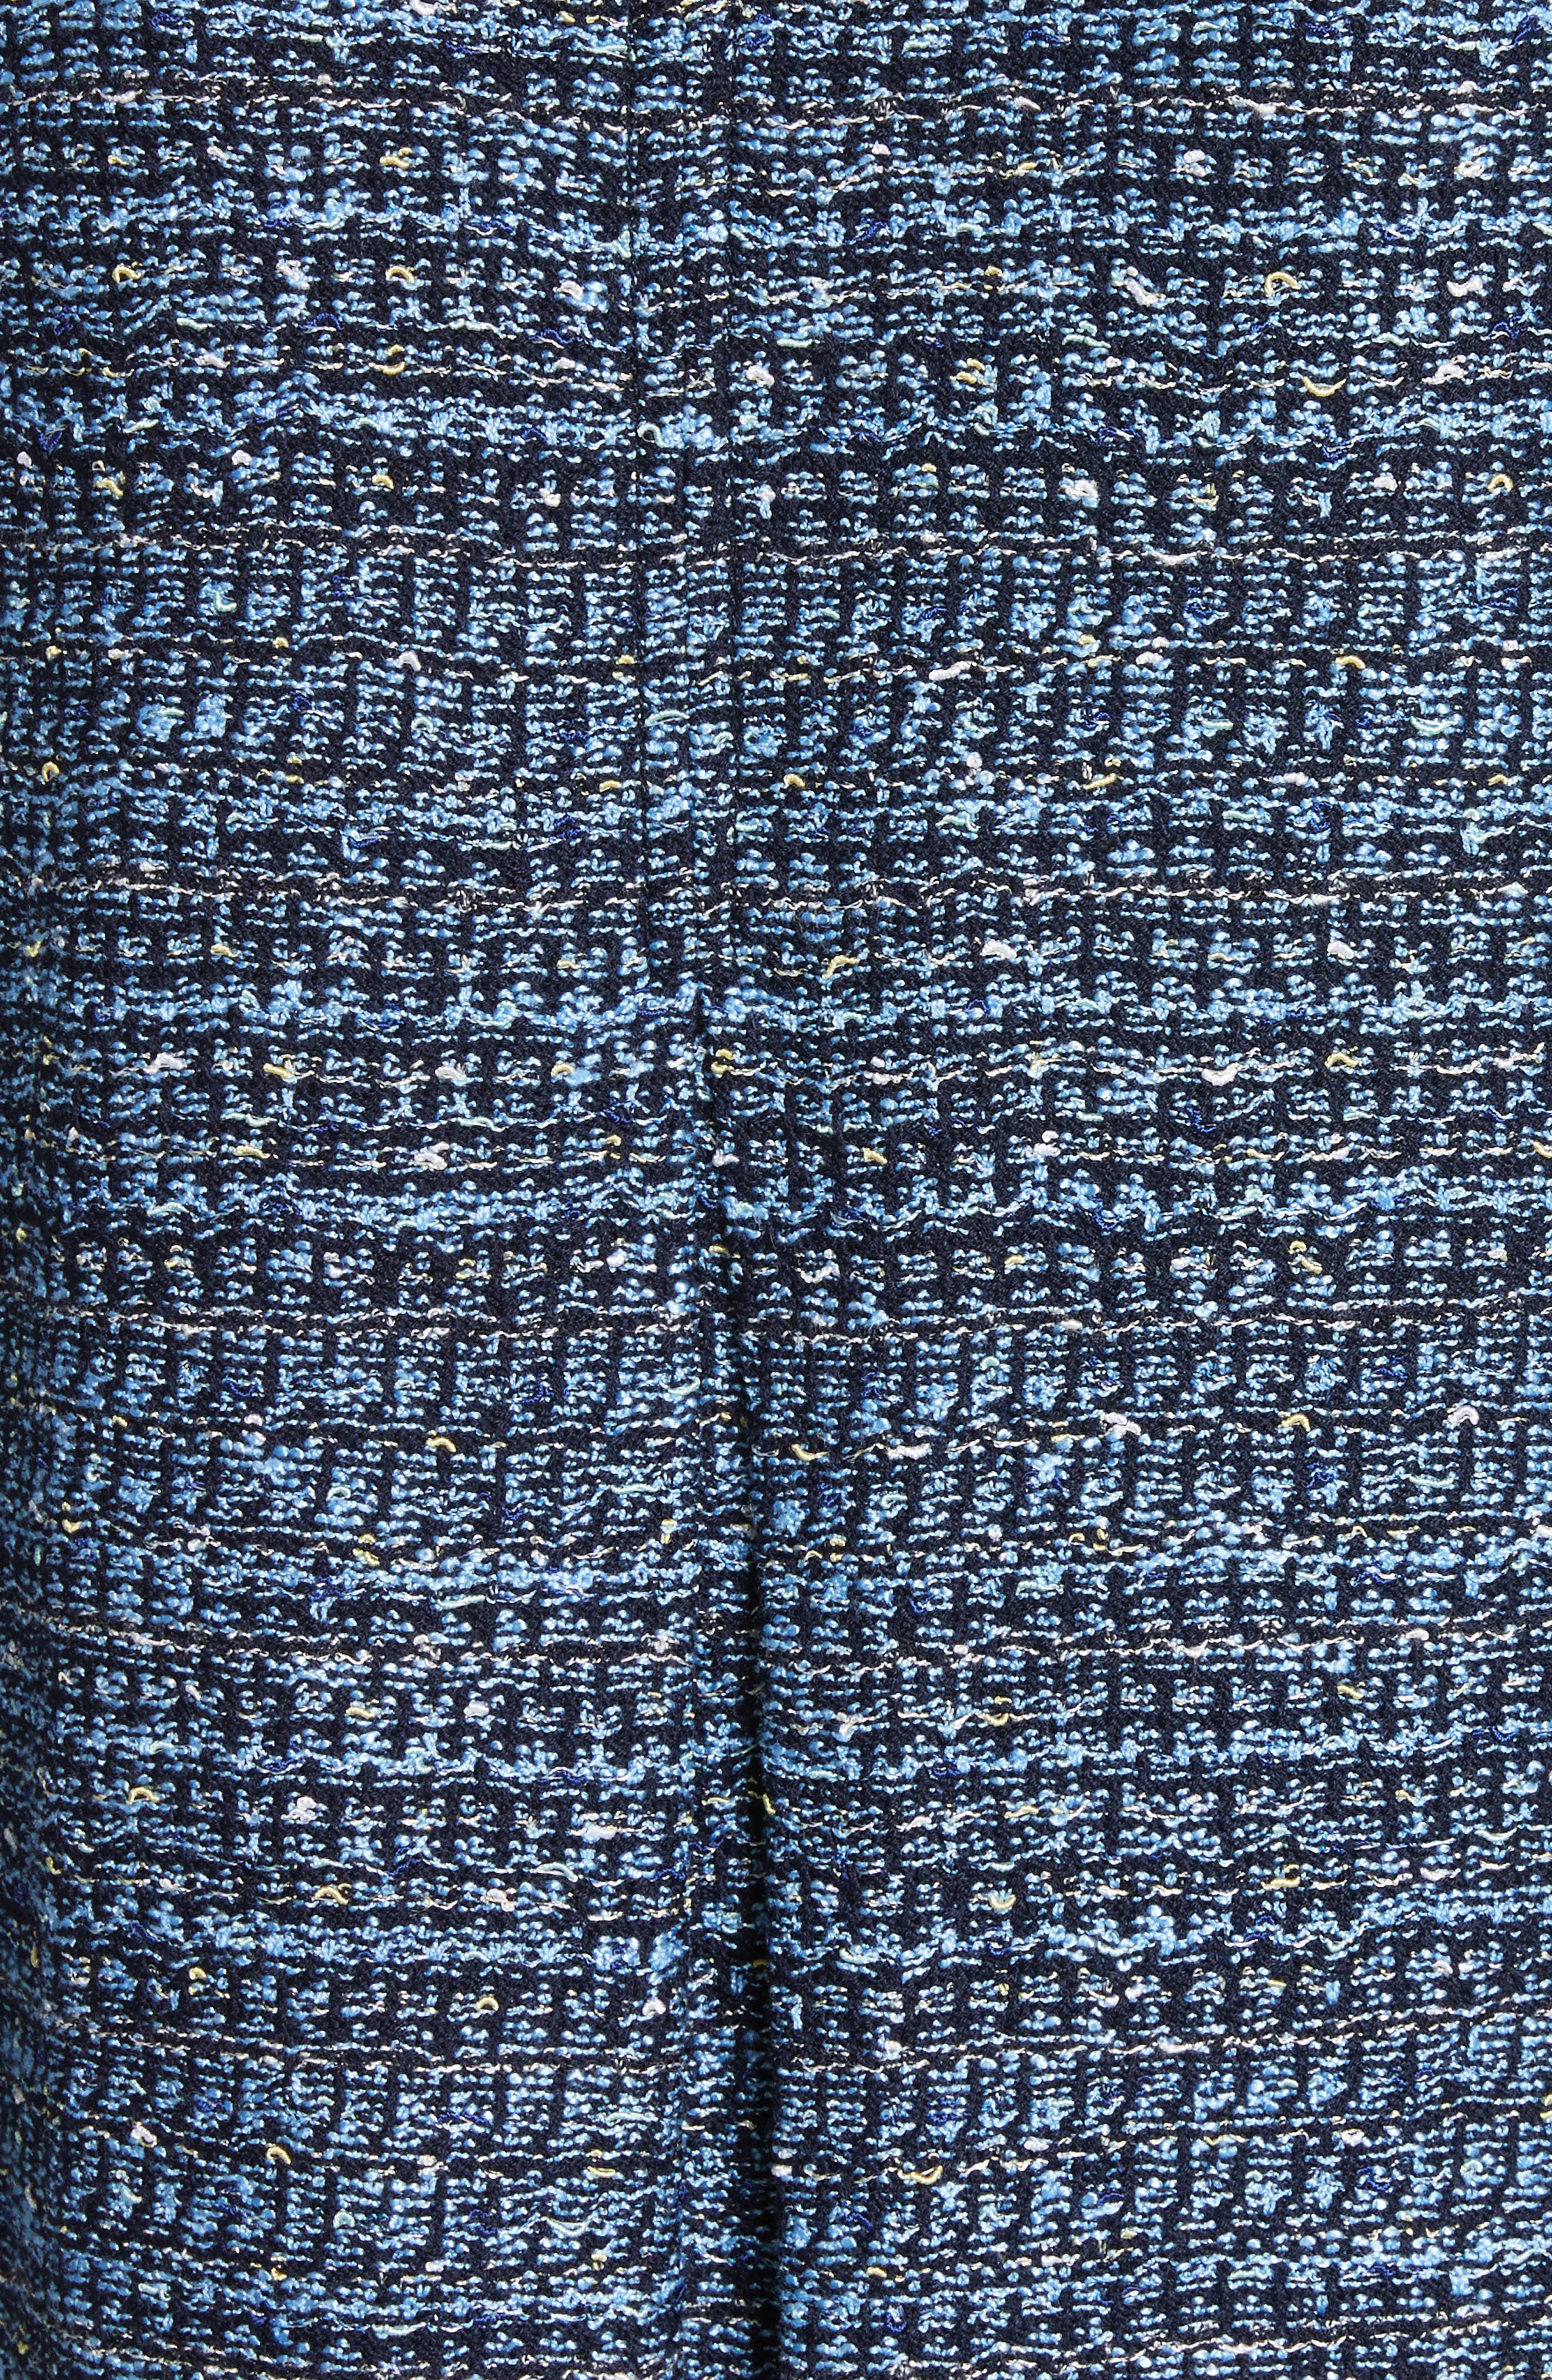 Patch Pocket Knit Topper,                             Alternate thumbnail 6, color,                             410